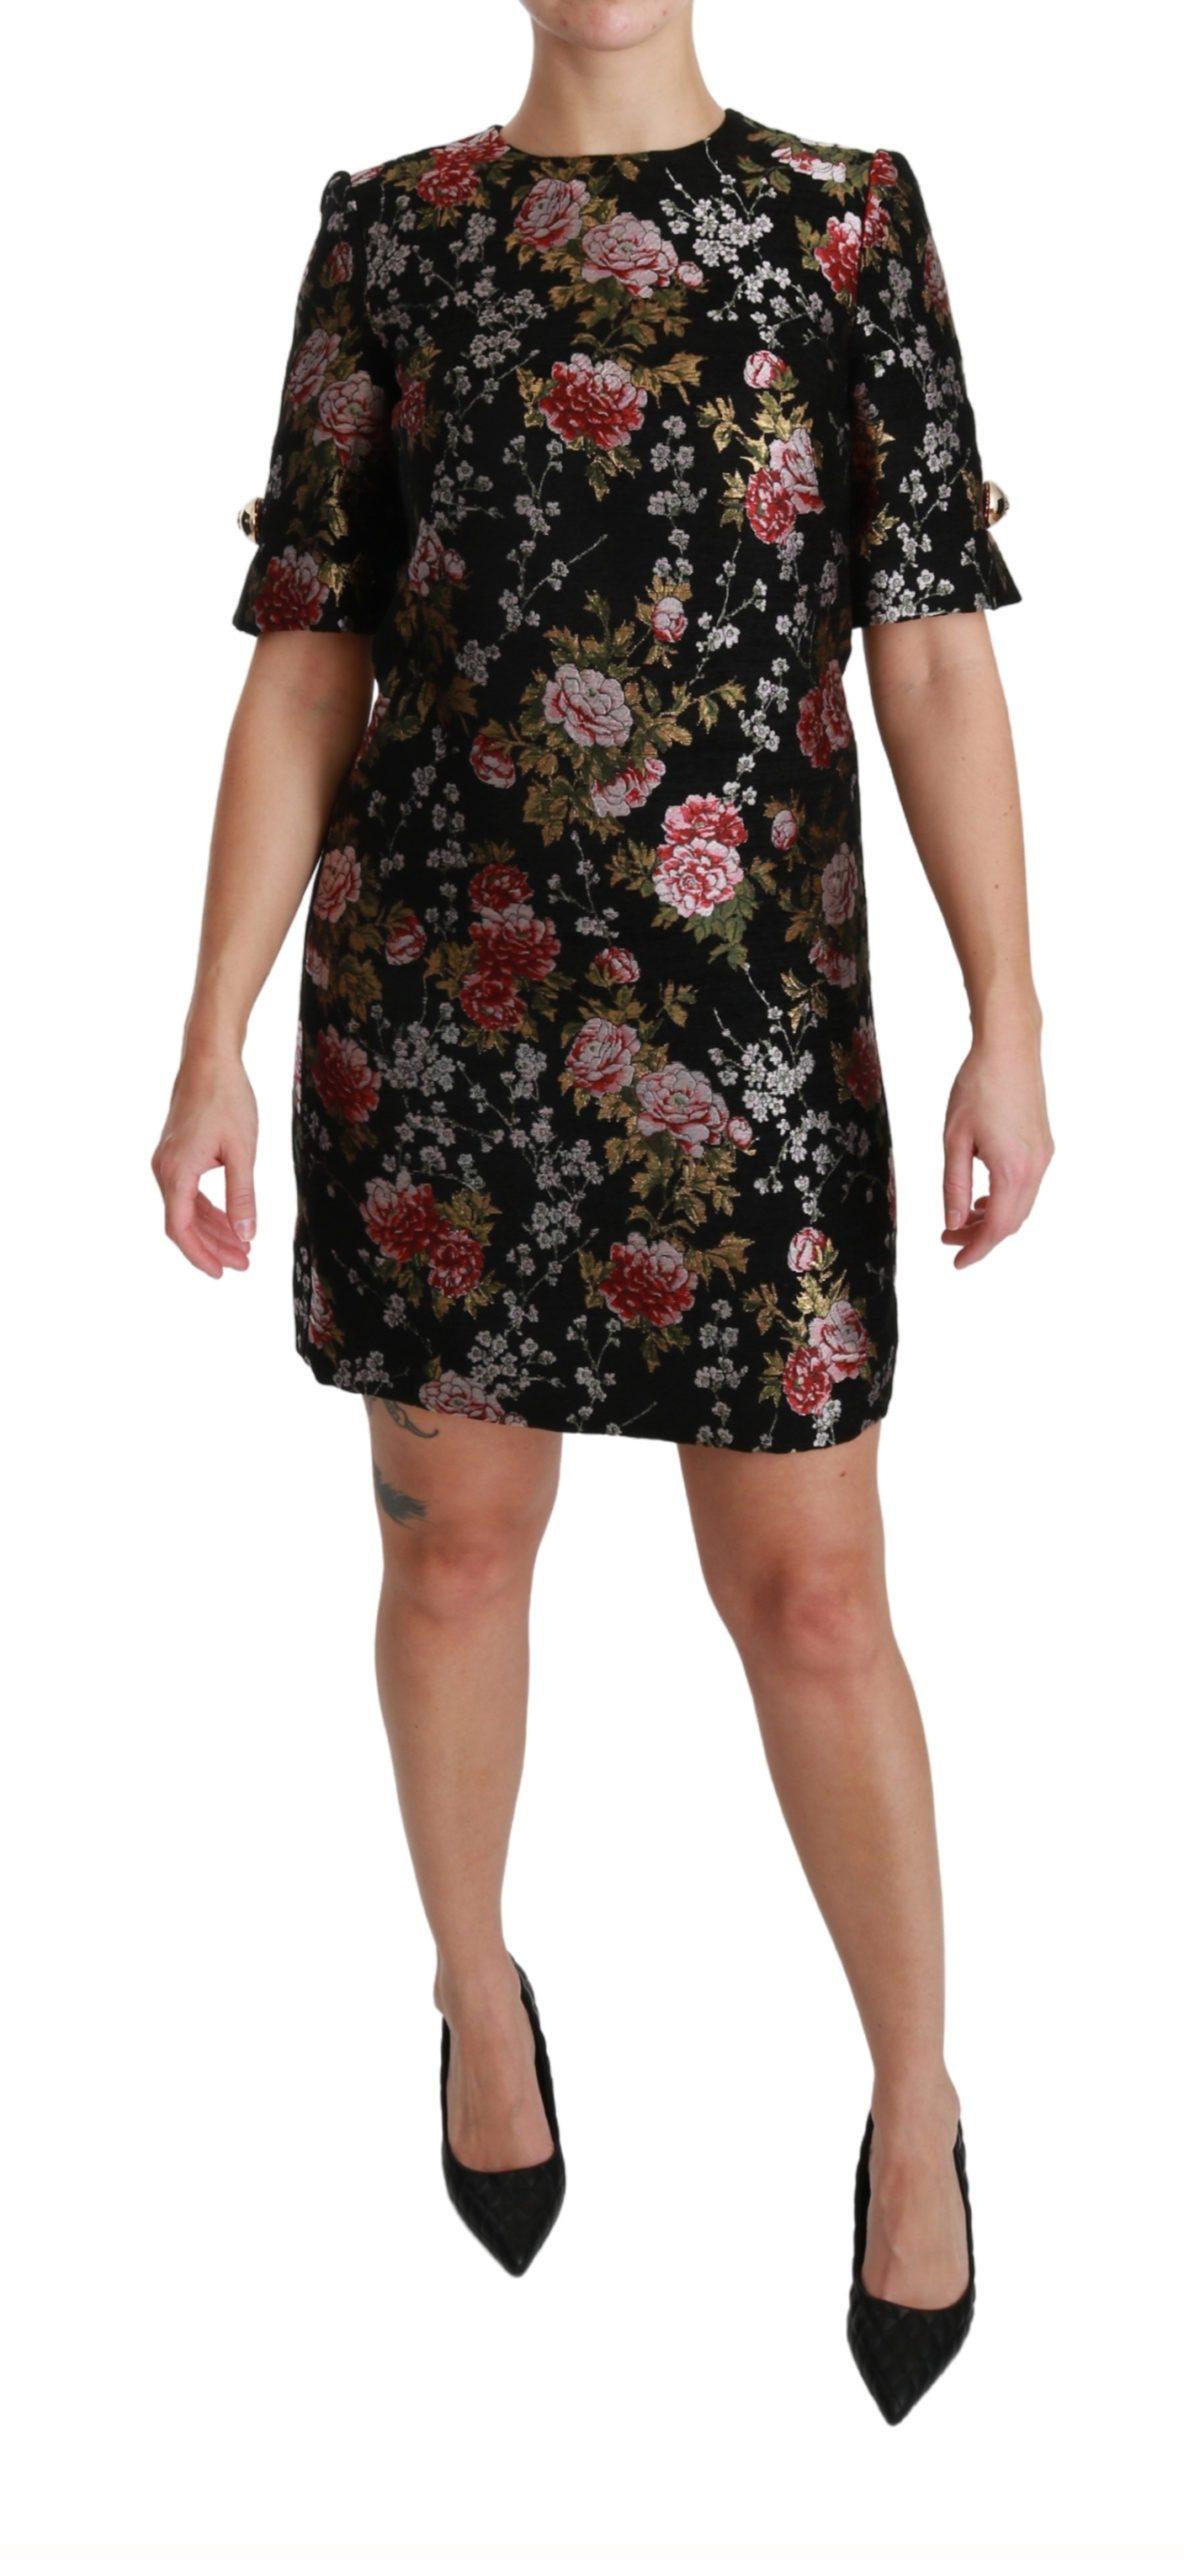 Dolce & Gabbana Women's Floral Brocade Sheath Mini Dress Black DR2527 - IT46|XL